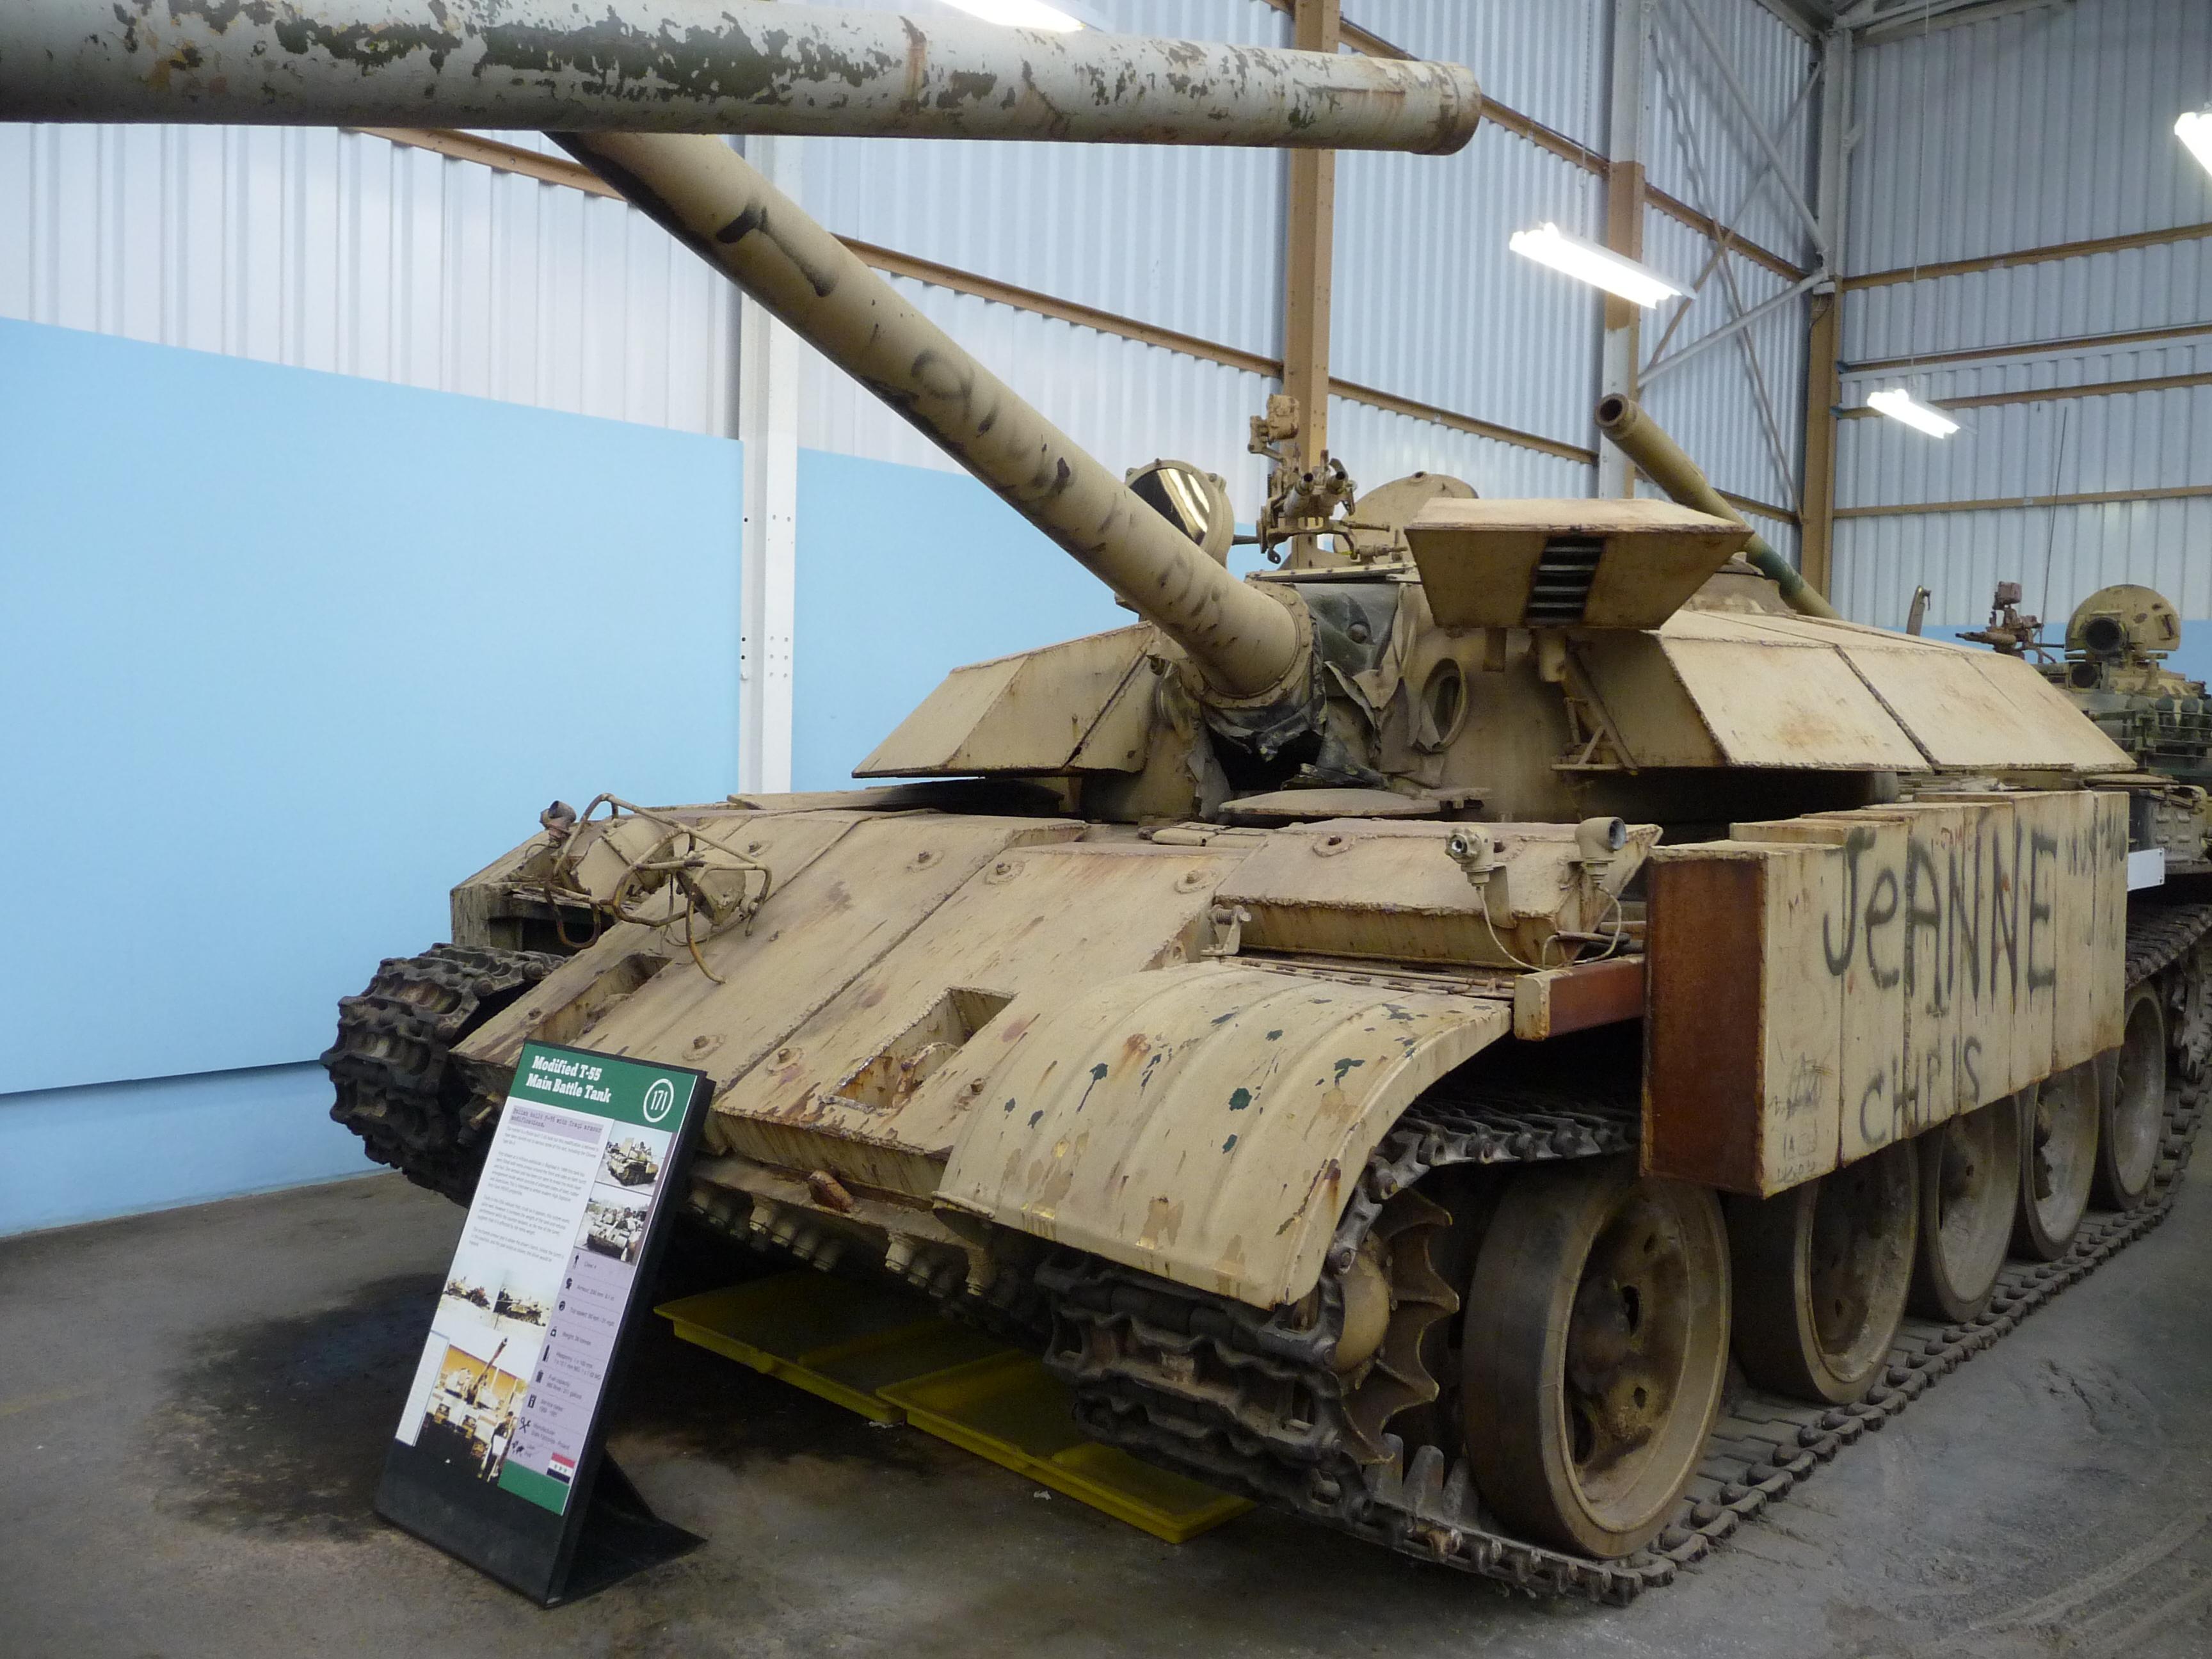 T-55_Enigma_tank_at_the_Bovington_Tank_M